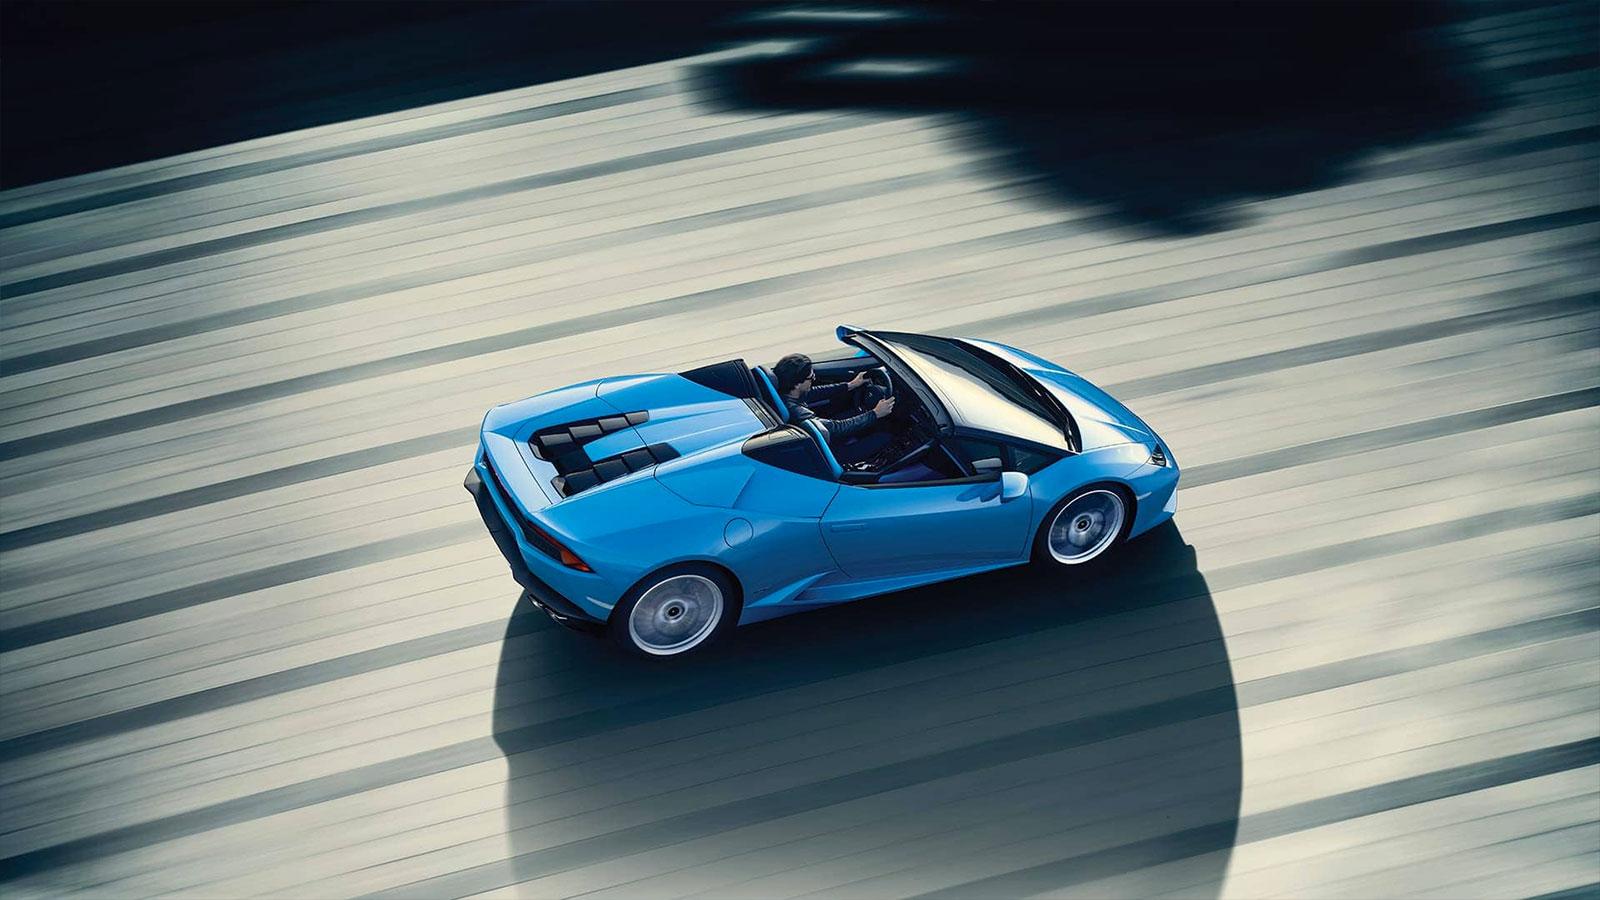 Lamborghini Huracan AWD Spyder - Inspiring Technology image 4